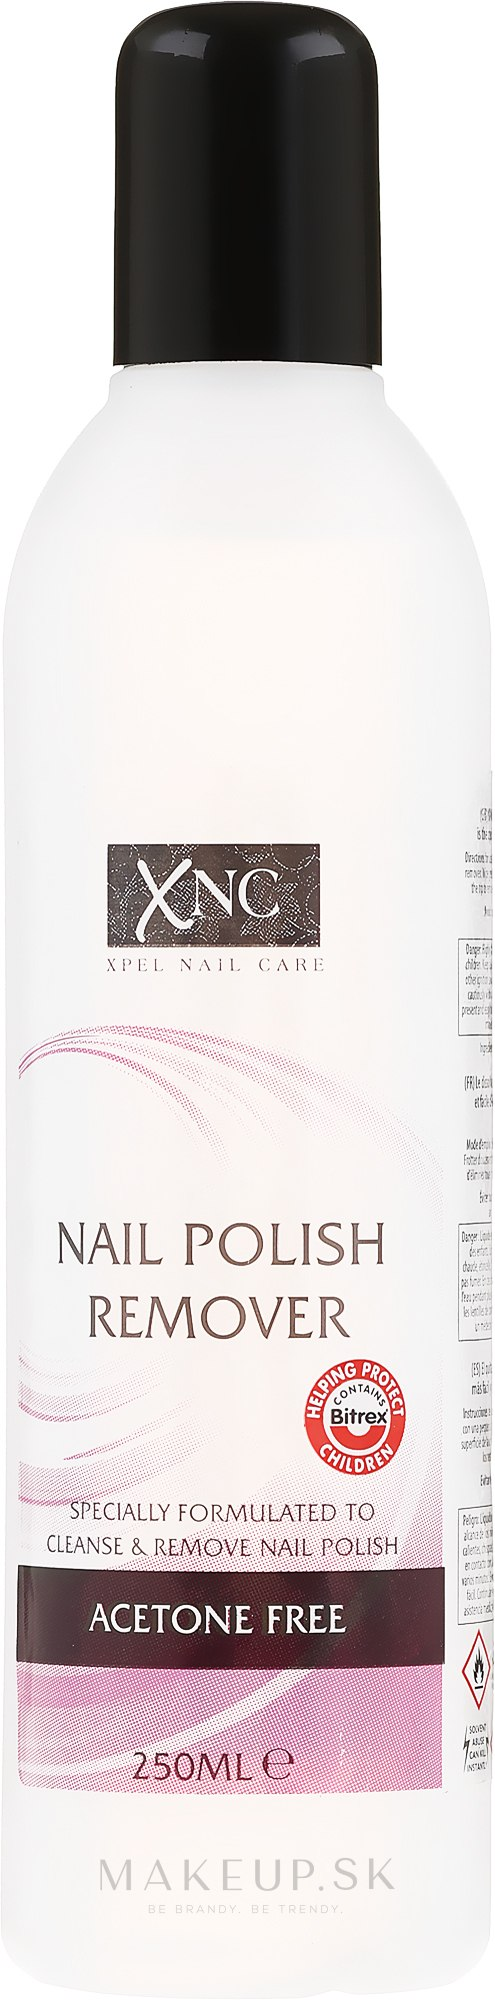 Odlakovač na nechty - Xpel Marketing Ltd Xnc Nail Polish Remover Acetone Free — Obrázky 250 ml